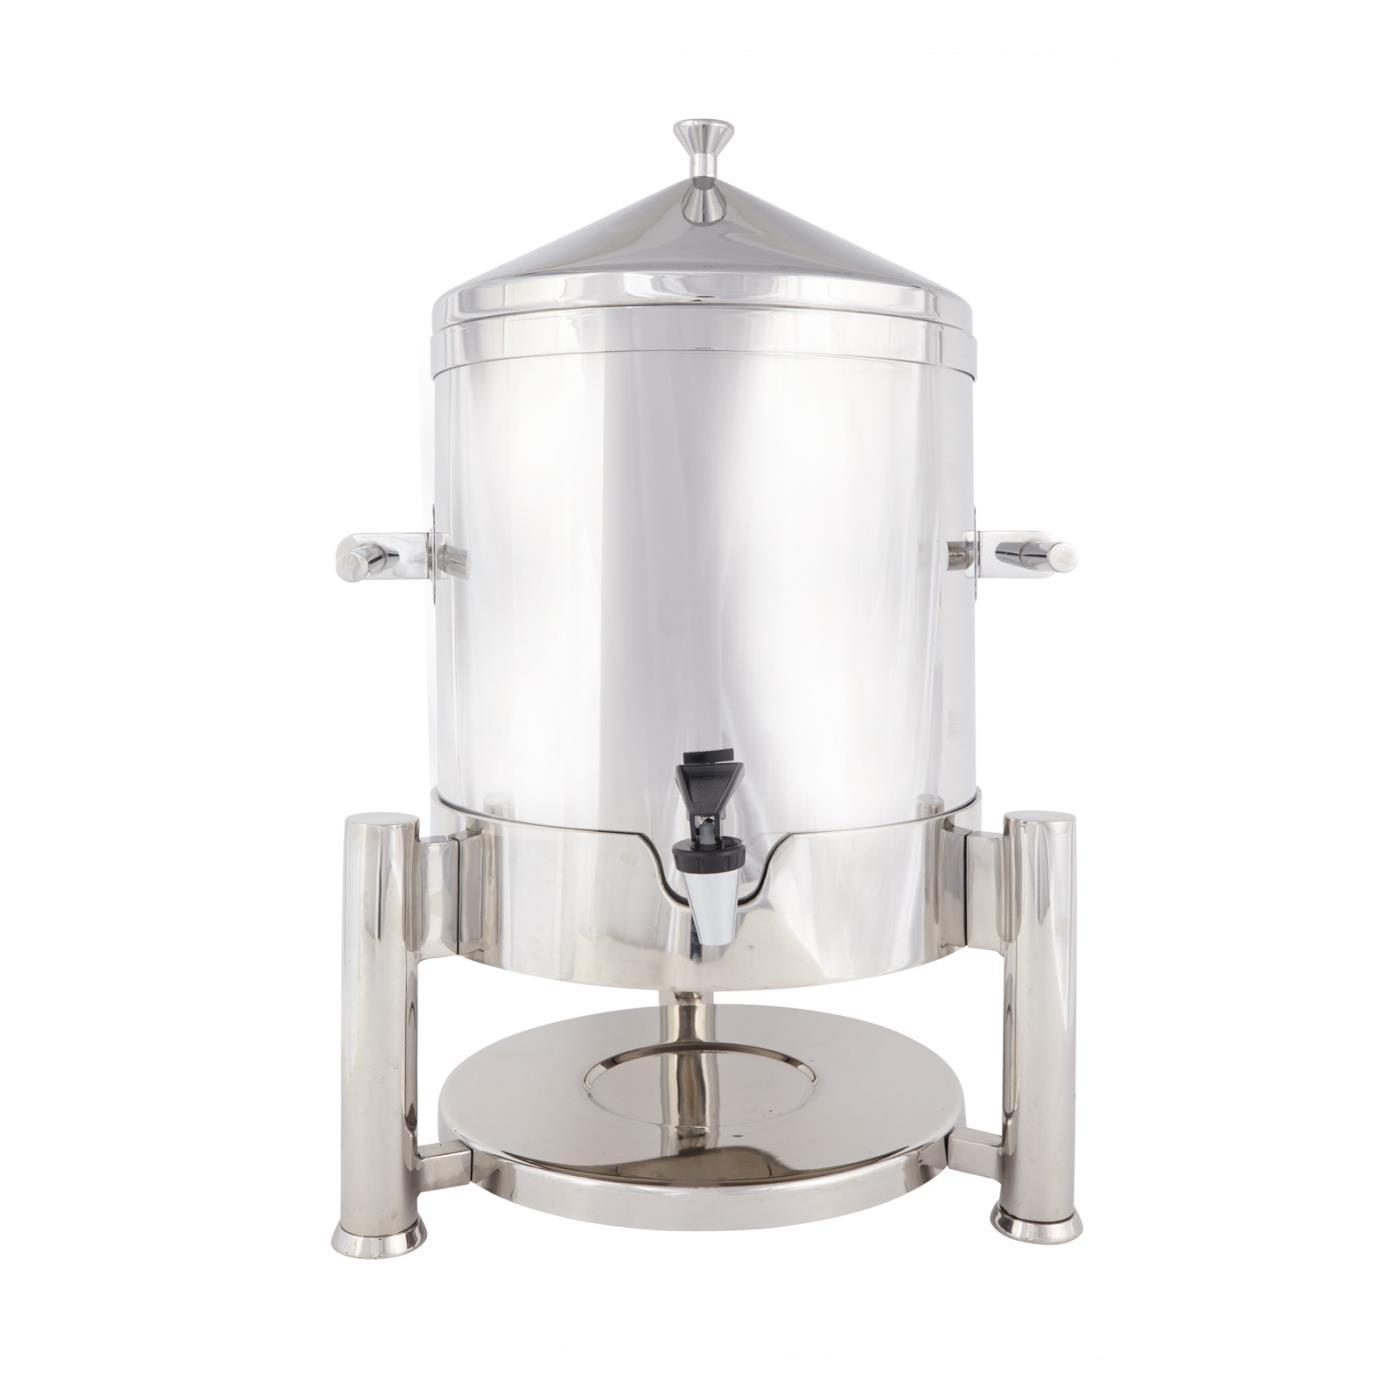 Stainless Steel Samovar 75 Cup